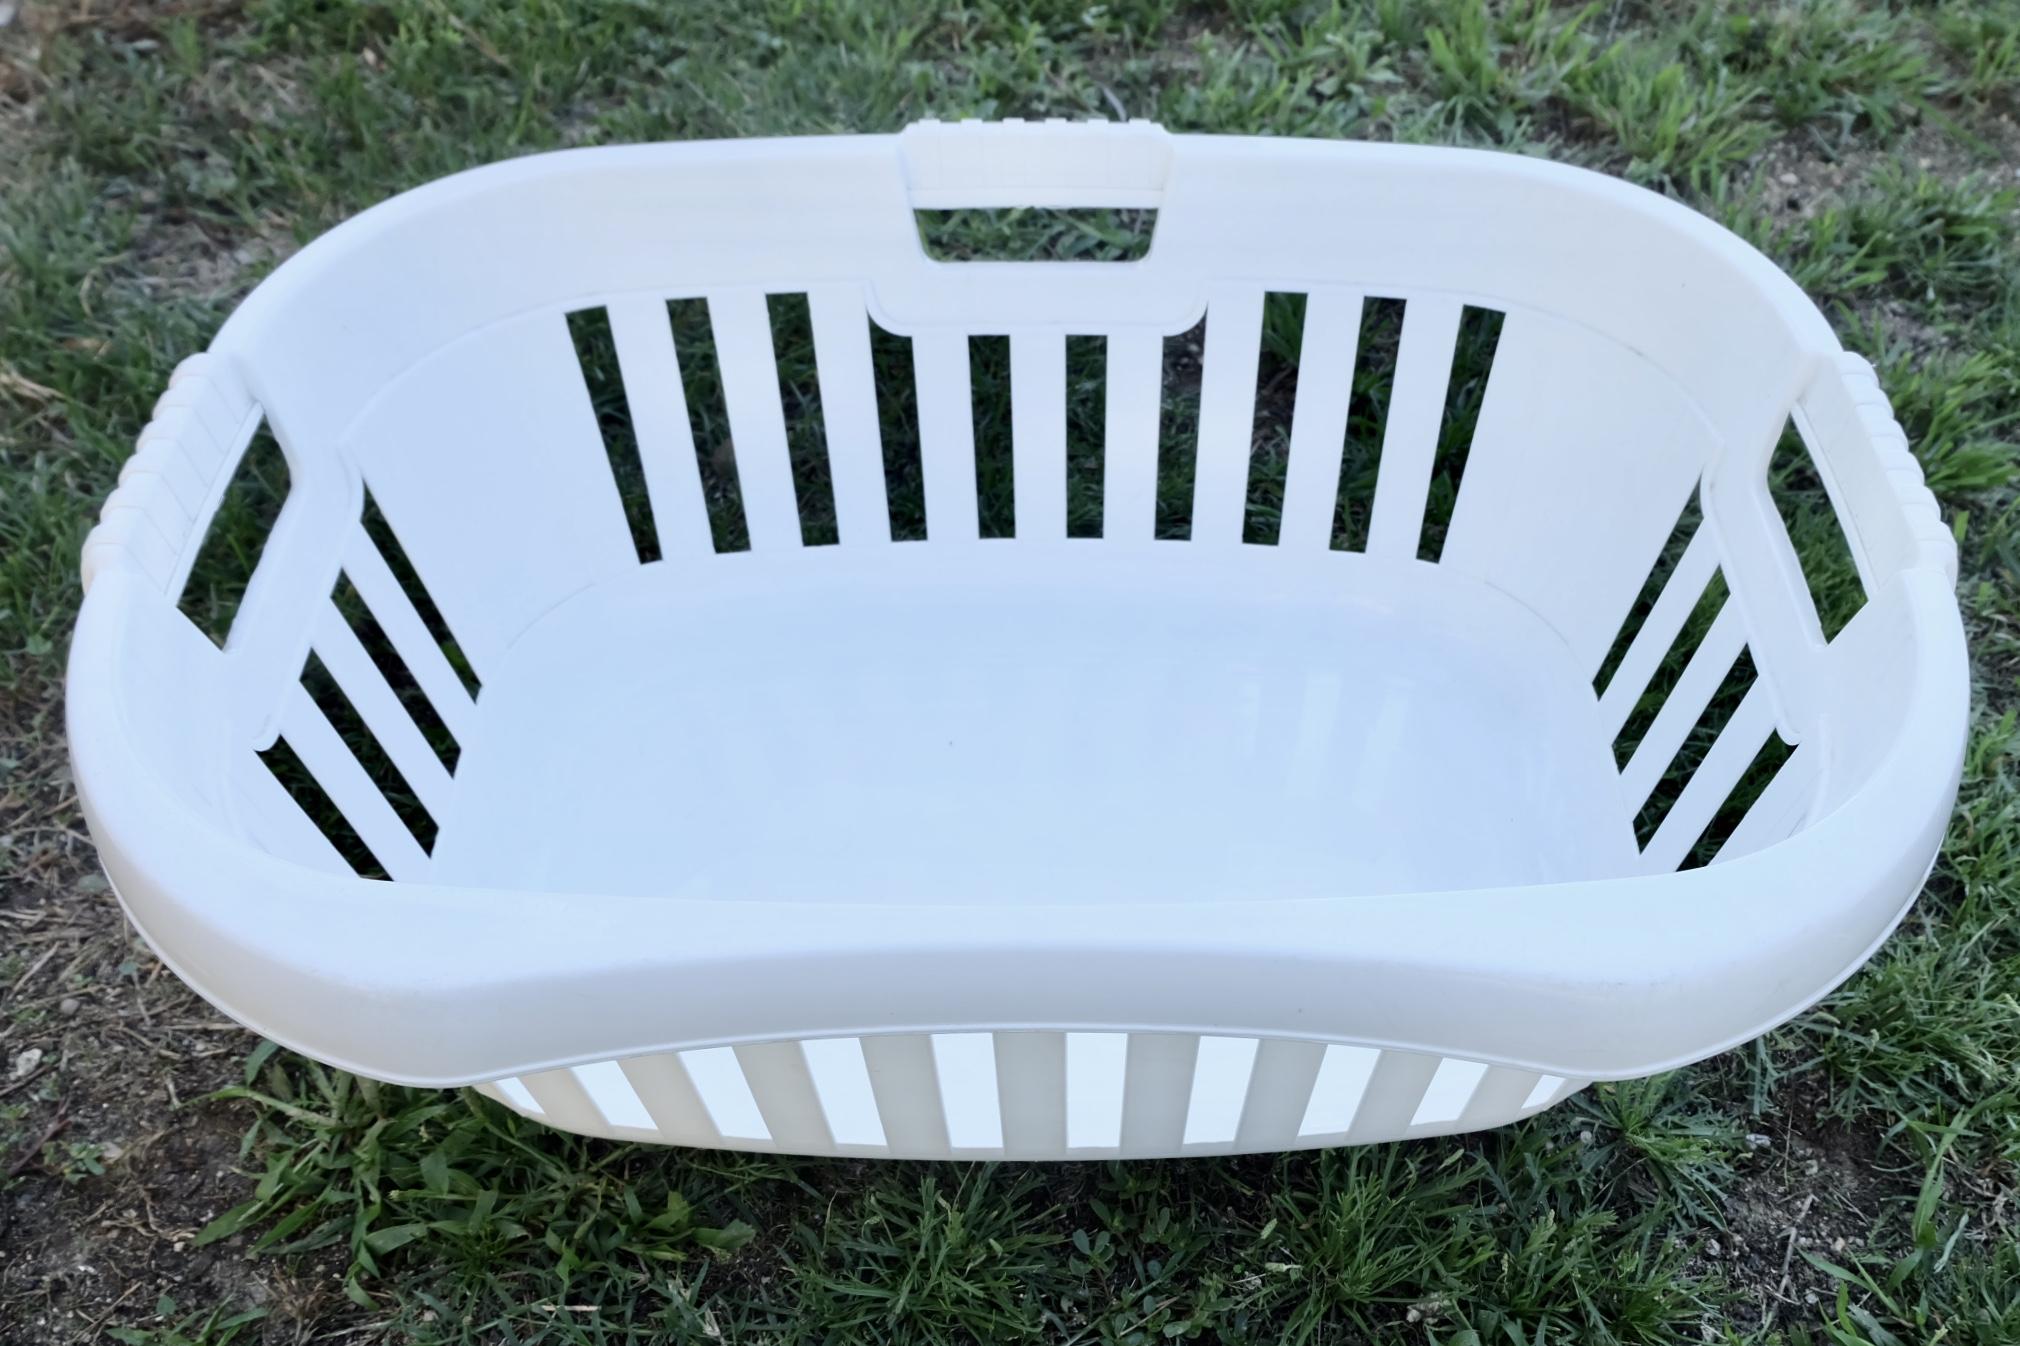 Laundry basket ergonomics